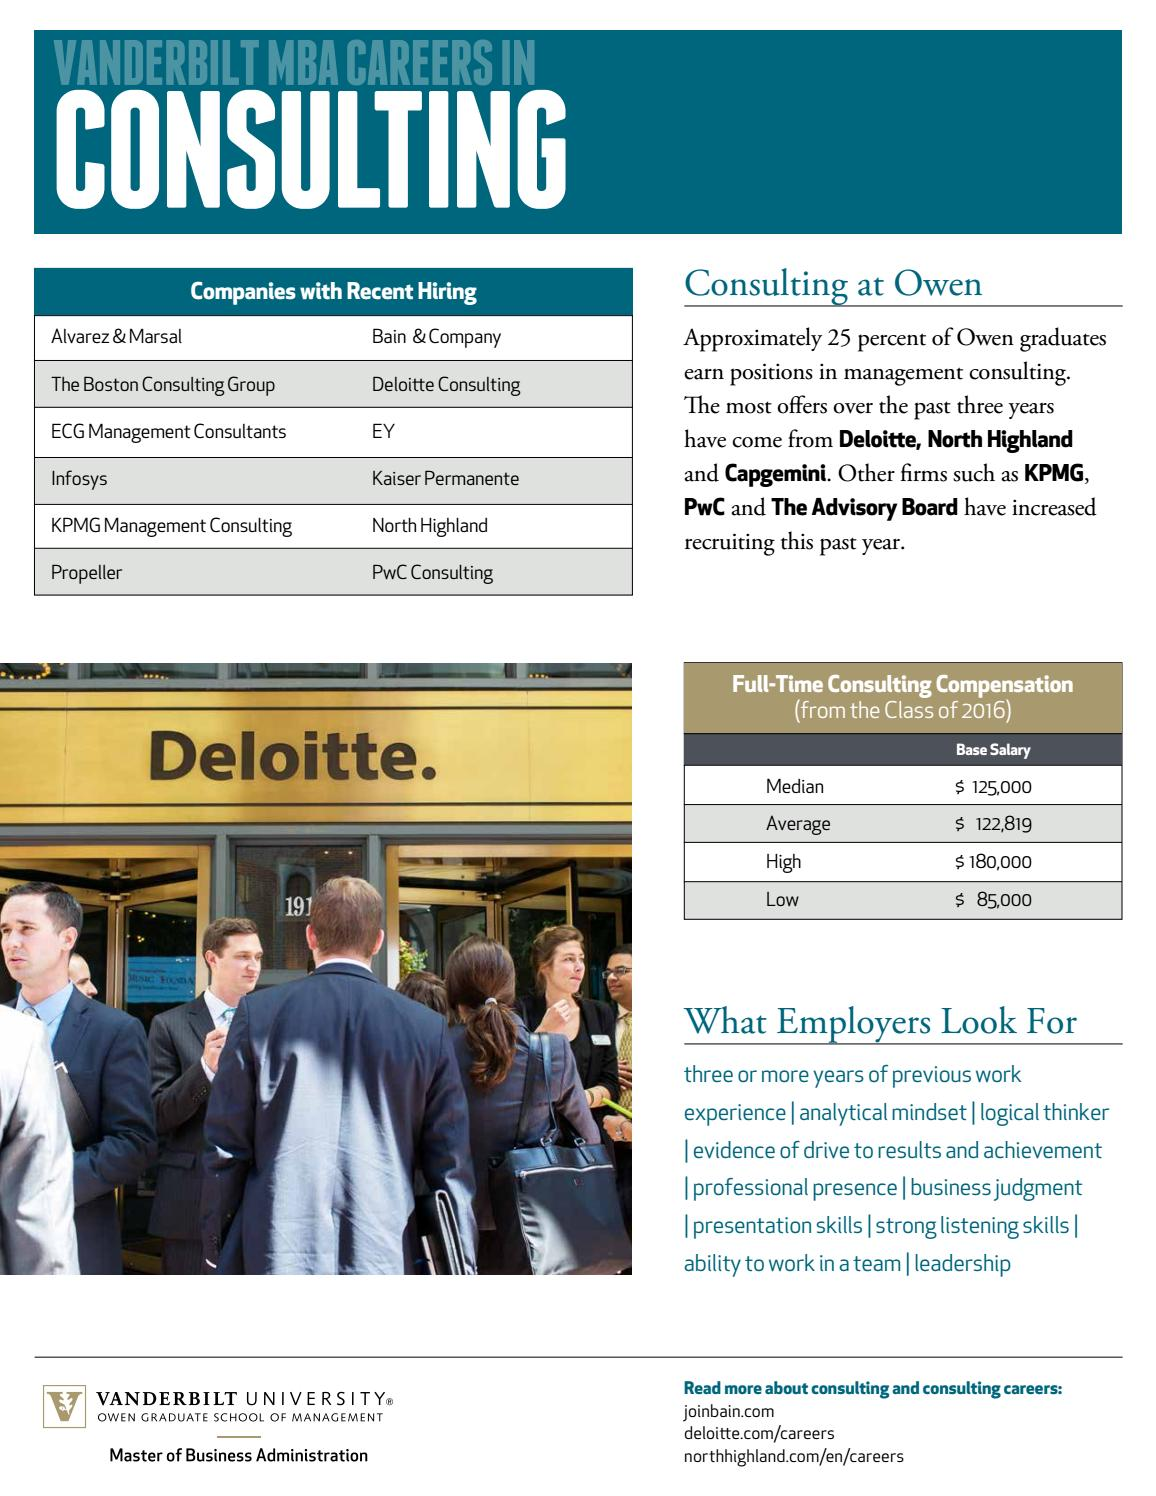 Vanderbilt MBA Careers in Consulting by Vanderbilt Owen